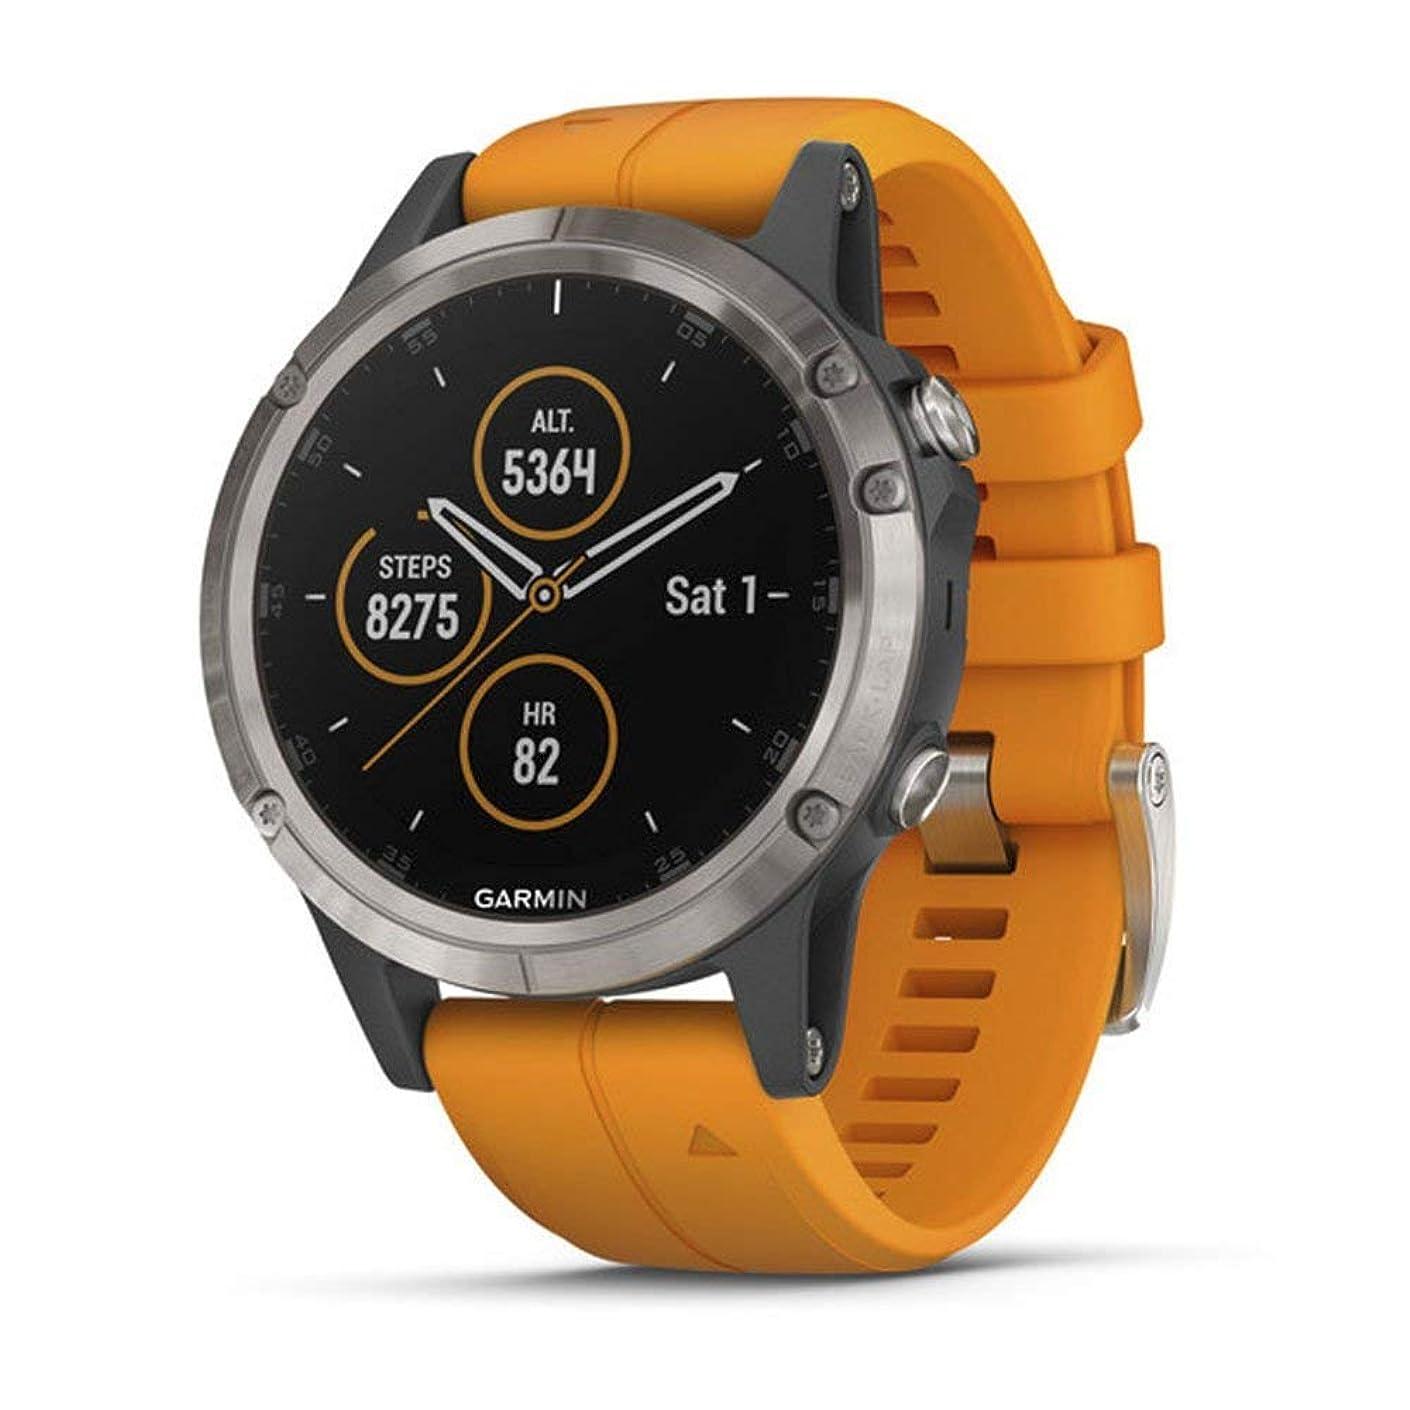 Garmin Fenix 5 Plus, Premium Multisport GPS Smartwatch, Features Color TOPO Maps, Heart Rate Monitoring, Music and Garmin Pay, Titanium with Orange (Renewed)